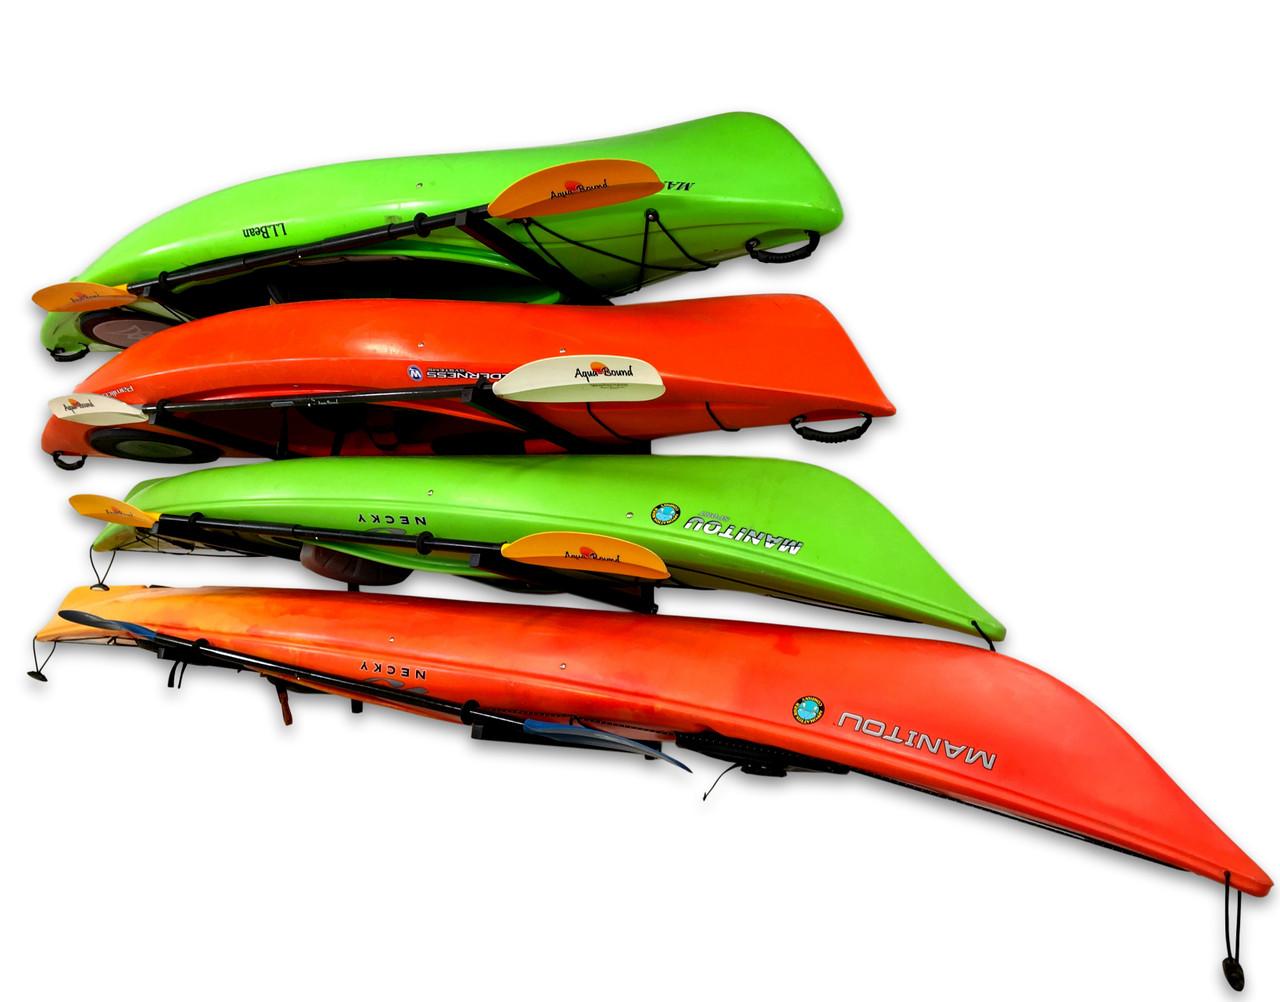 indoor adjustable wall storage rack for kayaks